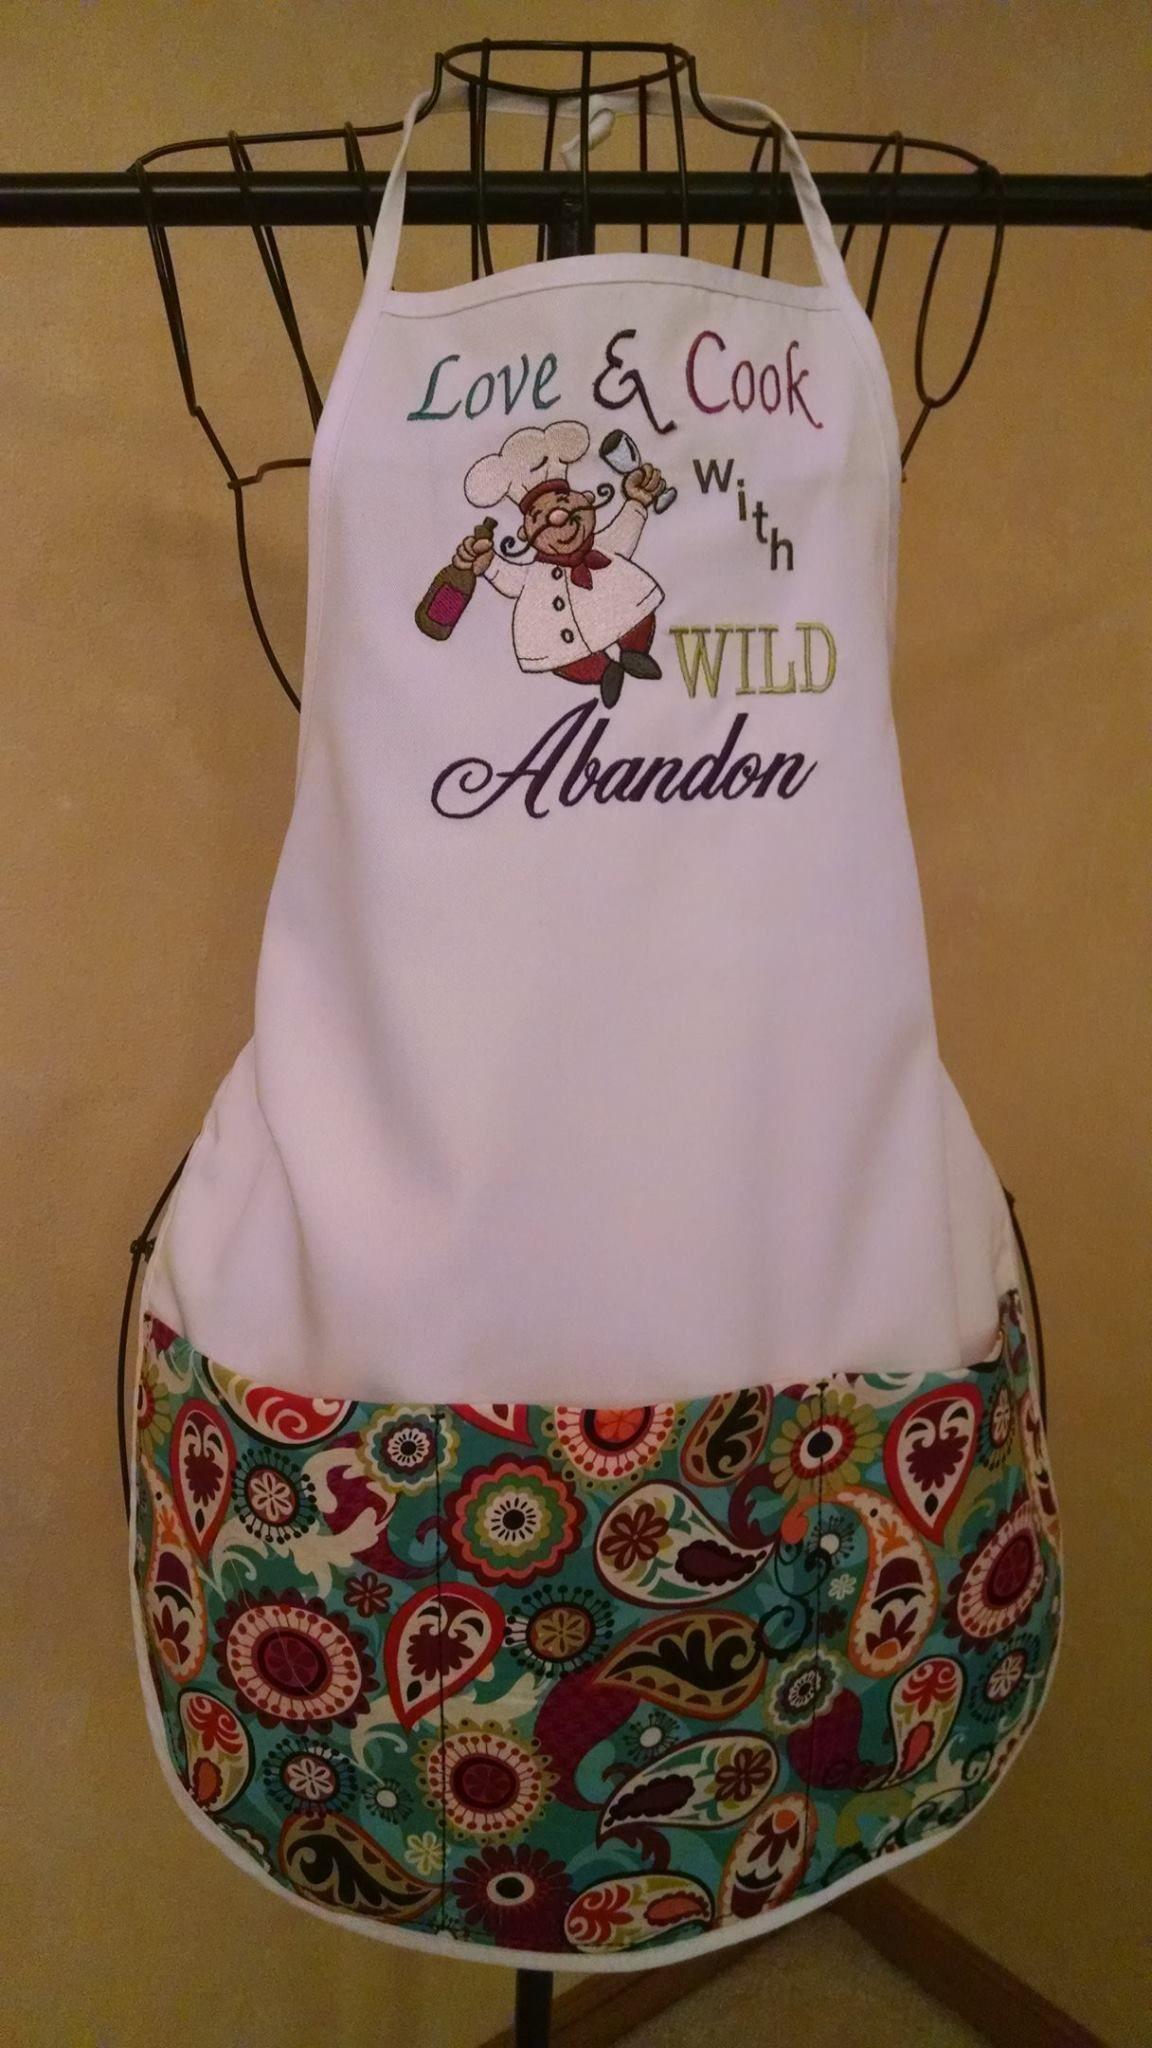 Bon Appetit Chefs Filled Set 1 embroidery design set available for instant download at designsbyjuju.com